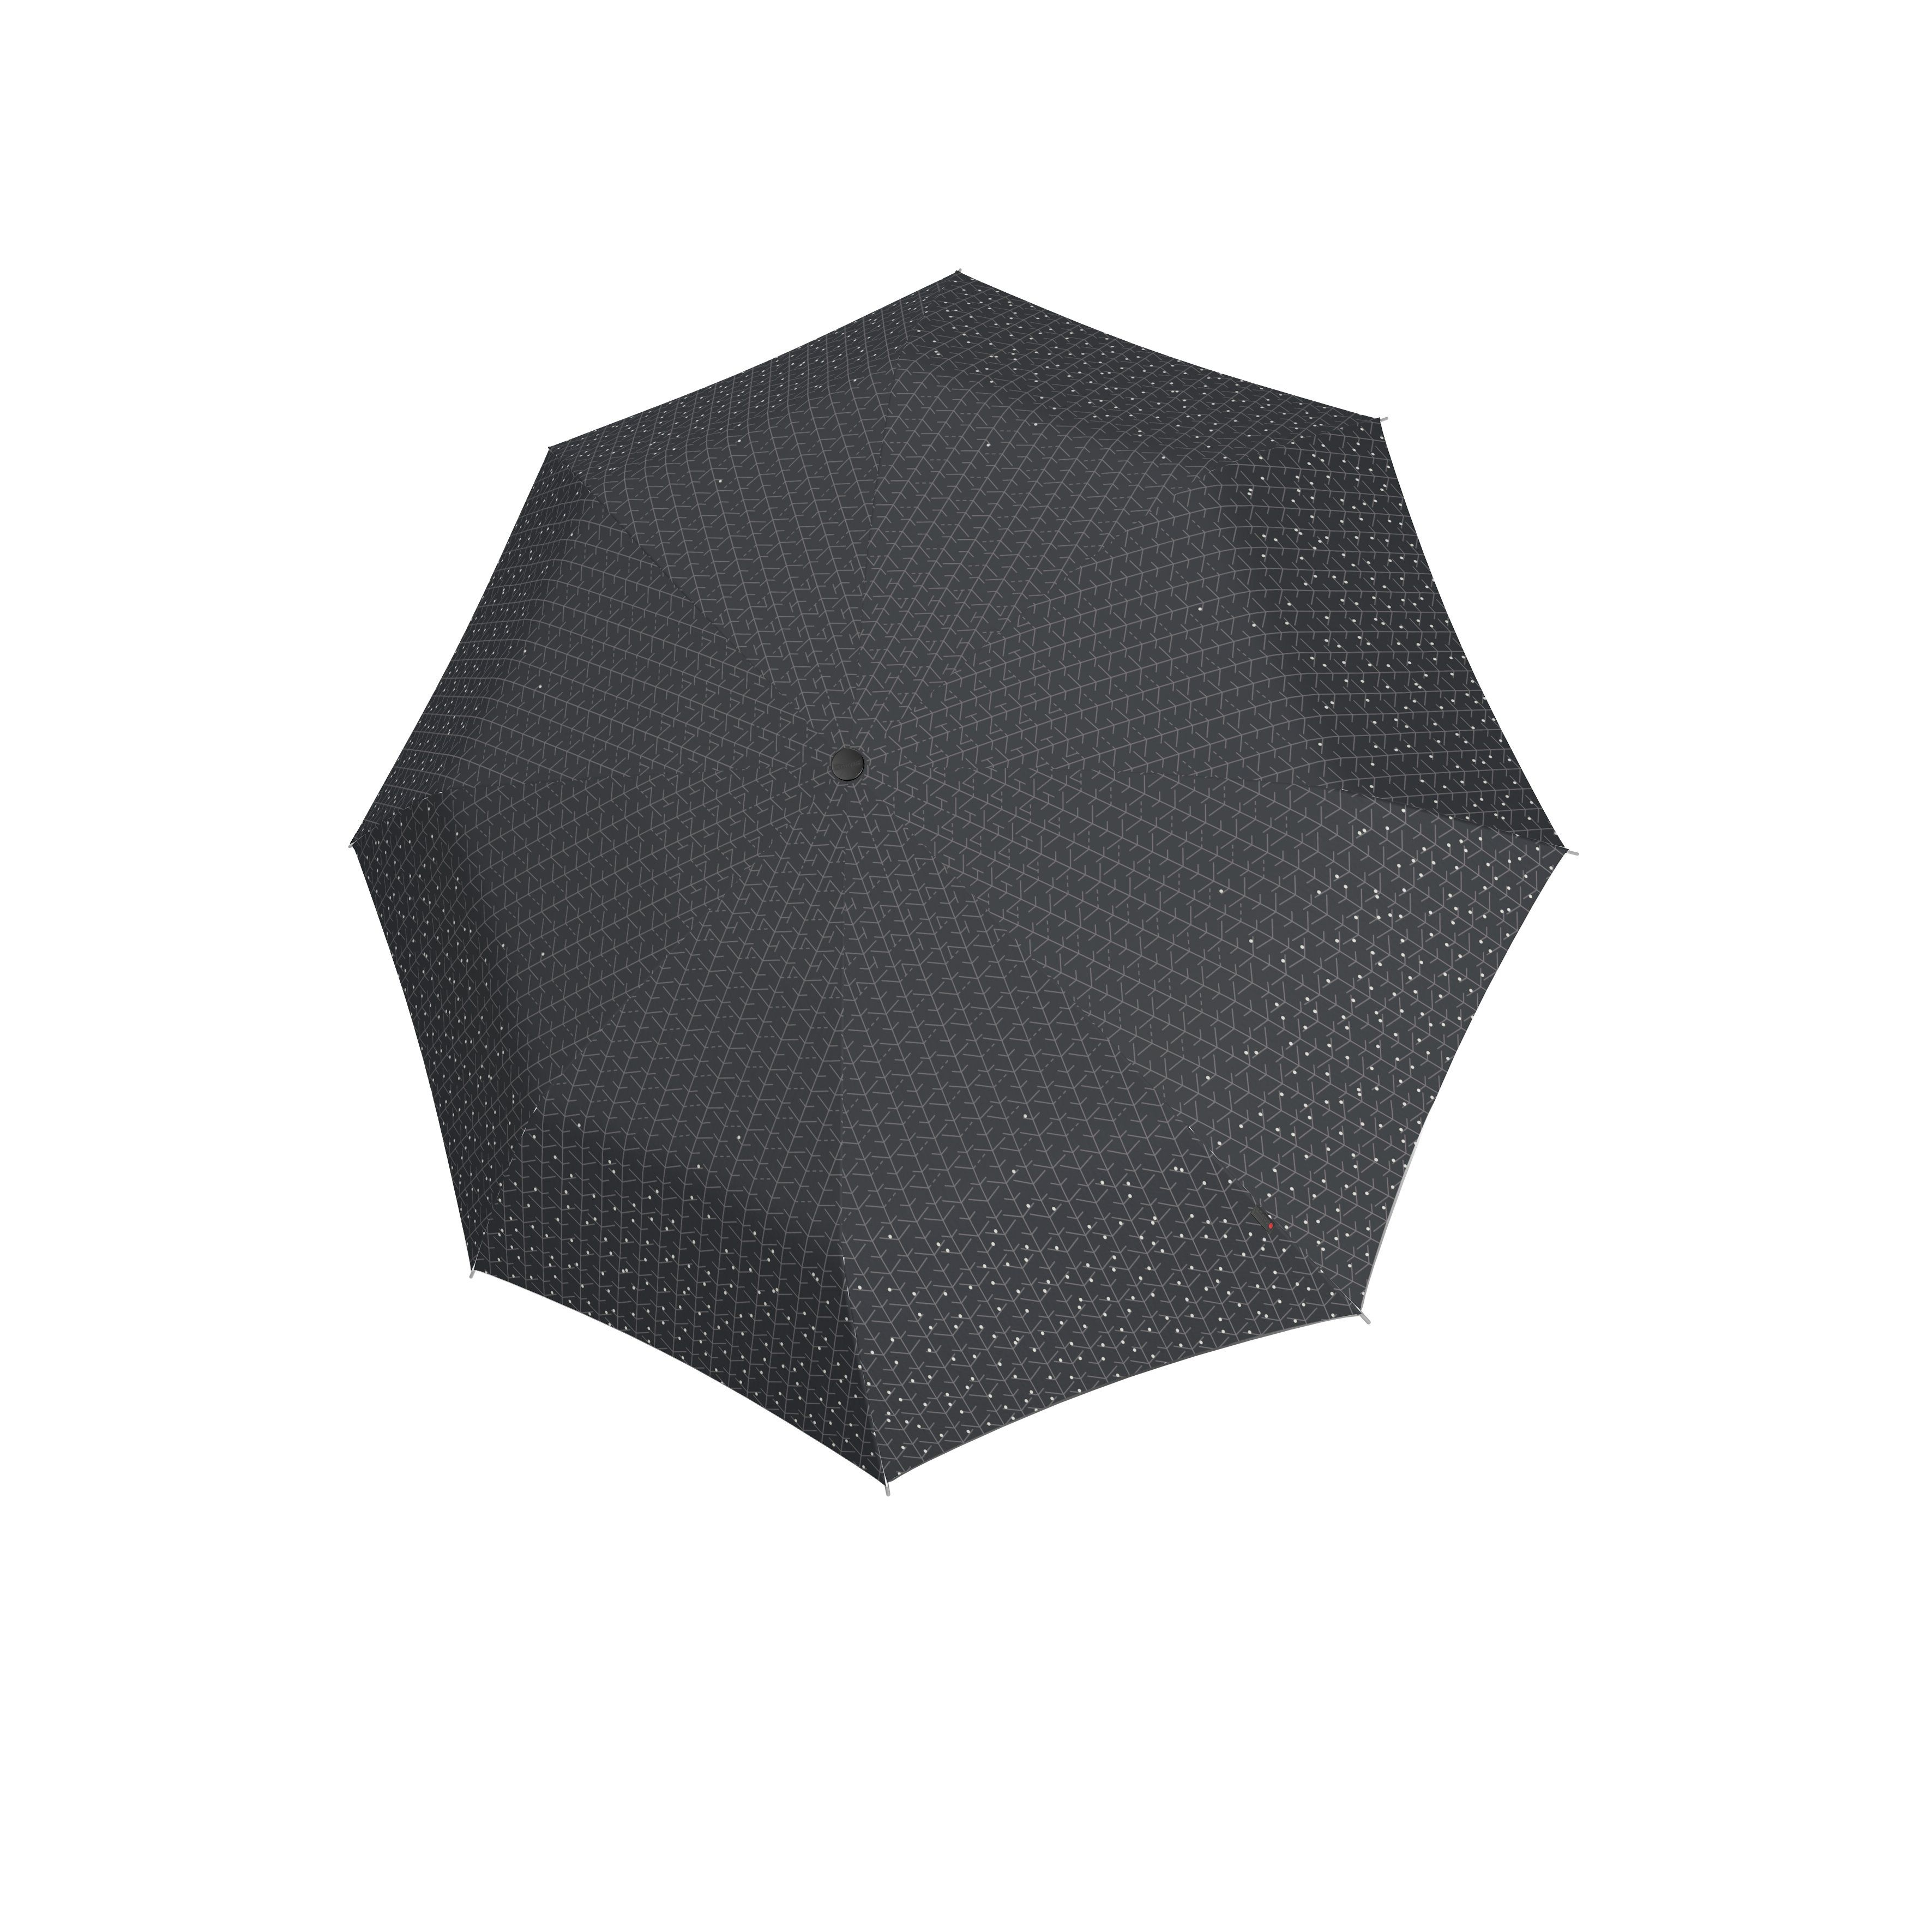 Knirps Umbrella Knirps T.760 stick automatic NUNO biru rock with UV Protection